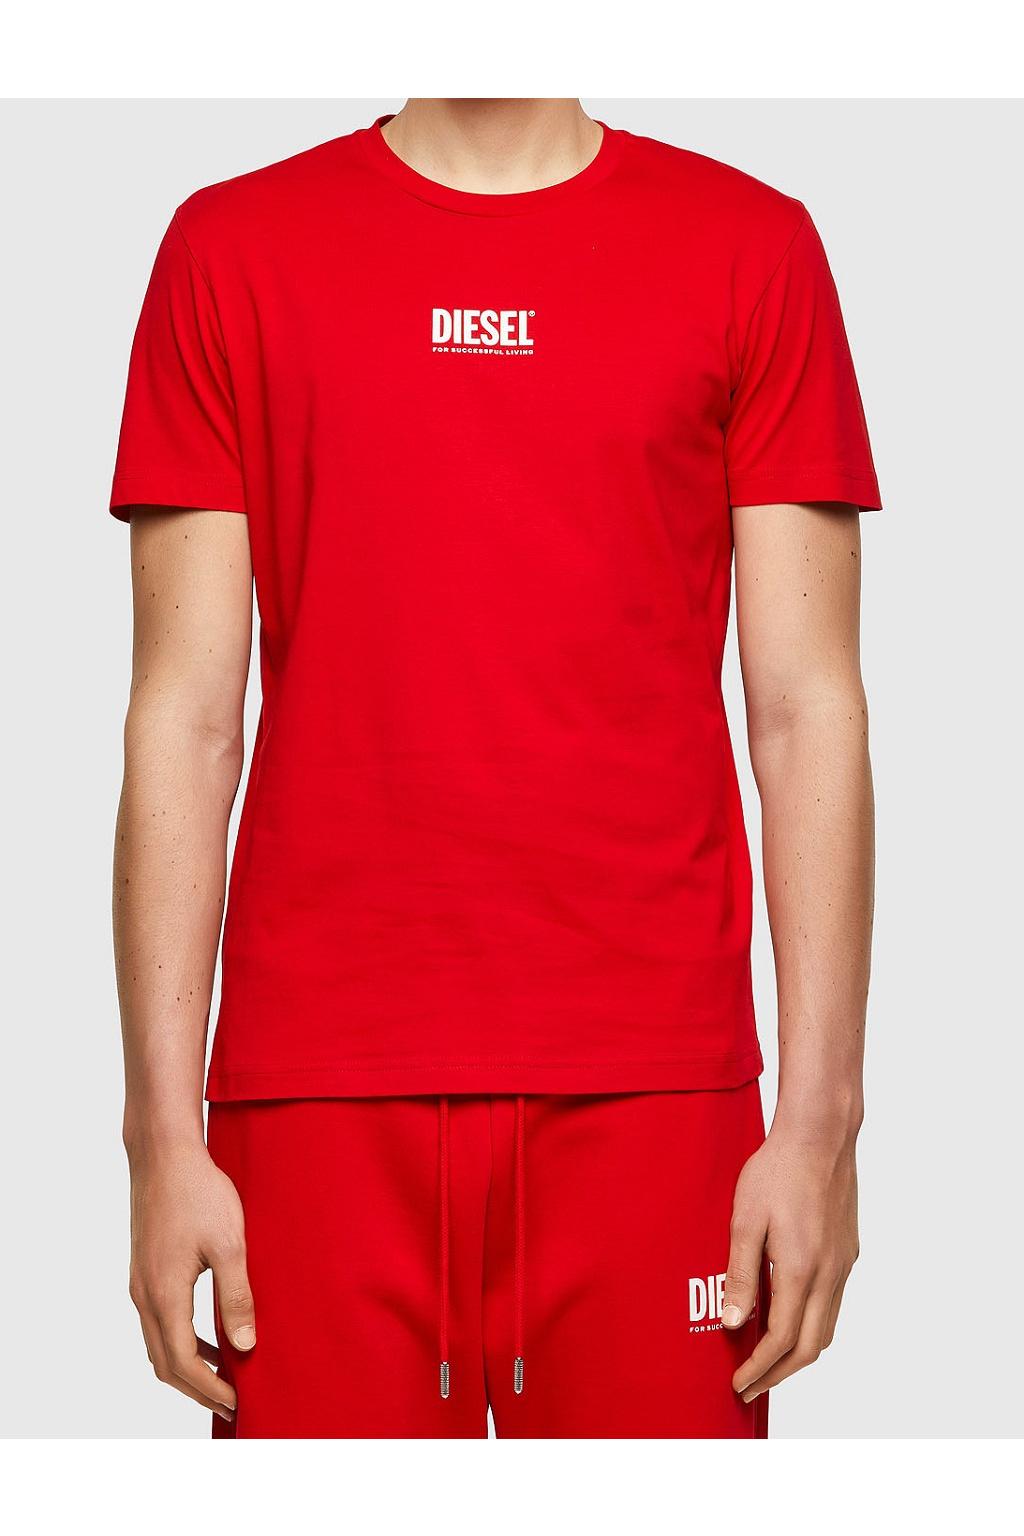 Pánské tričko Diesel T Diegos Ecosmallogo červené